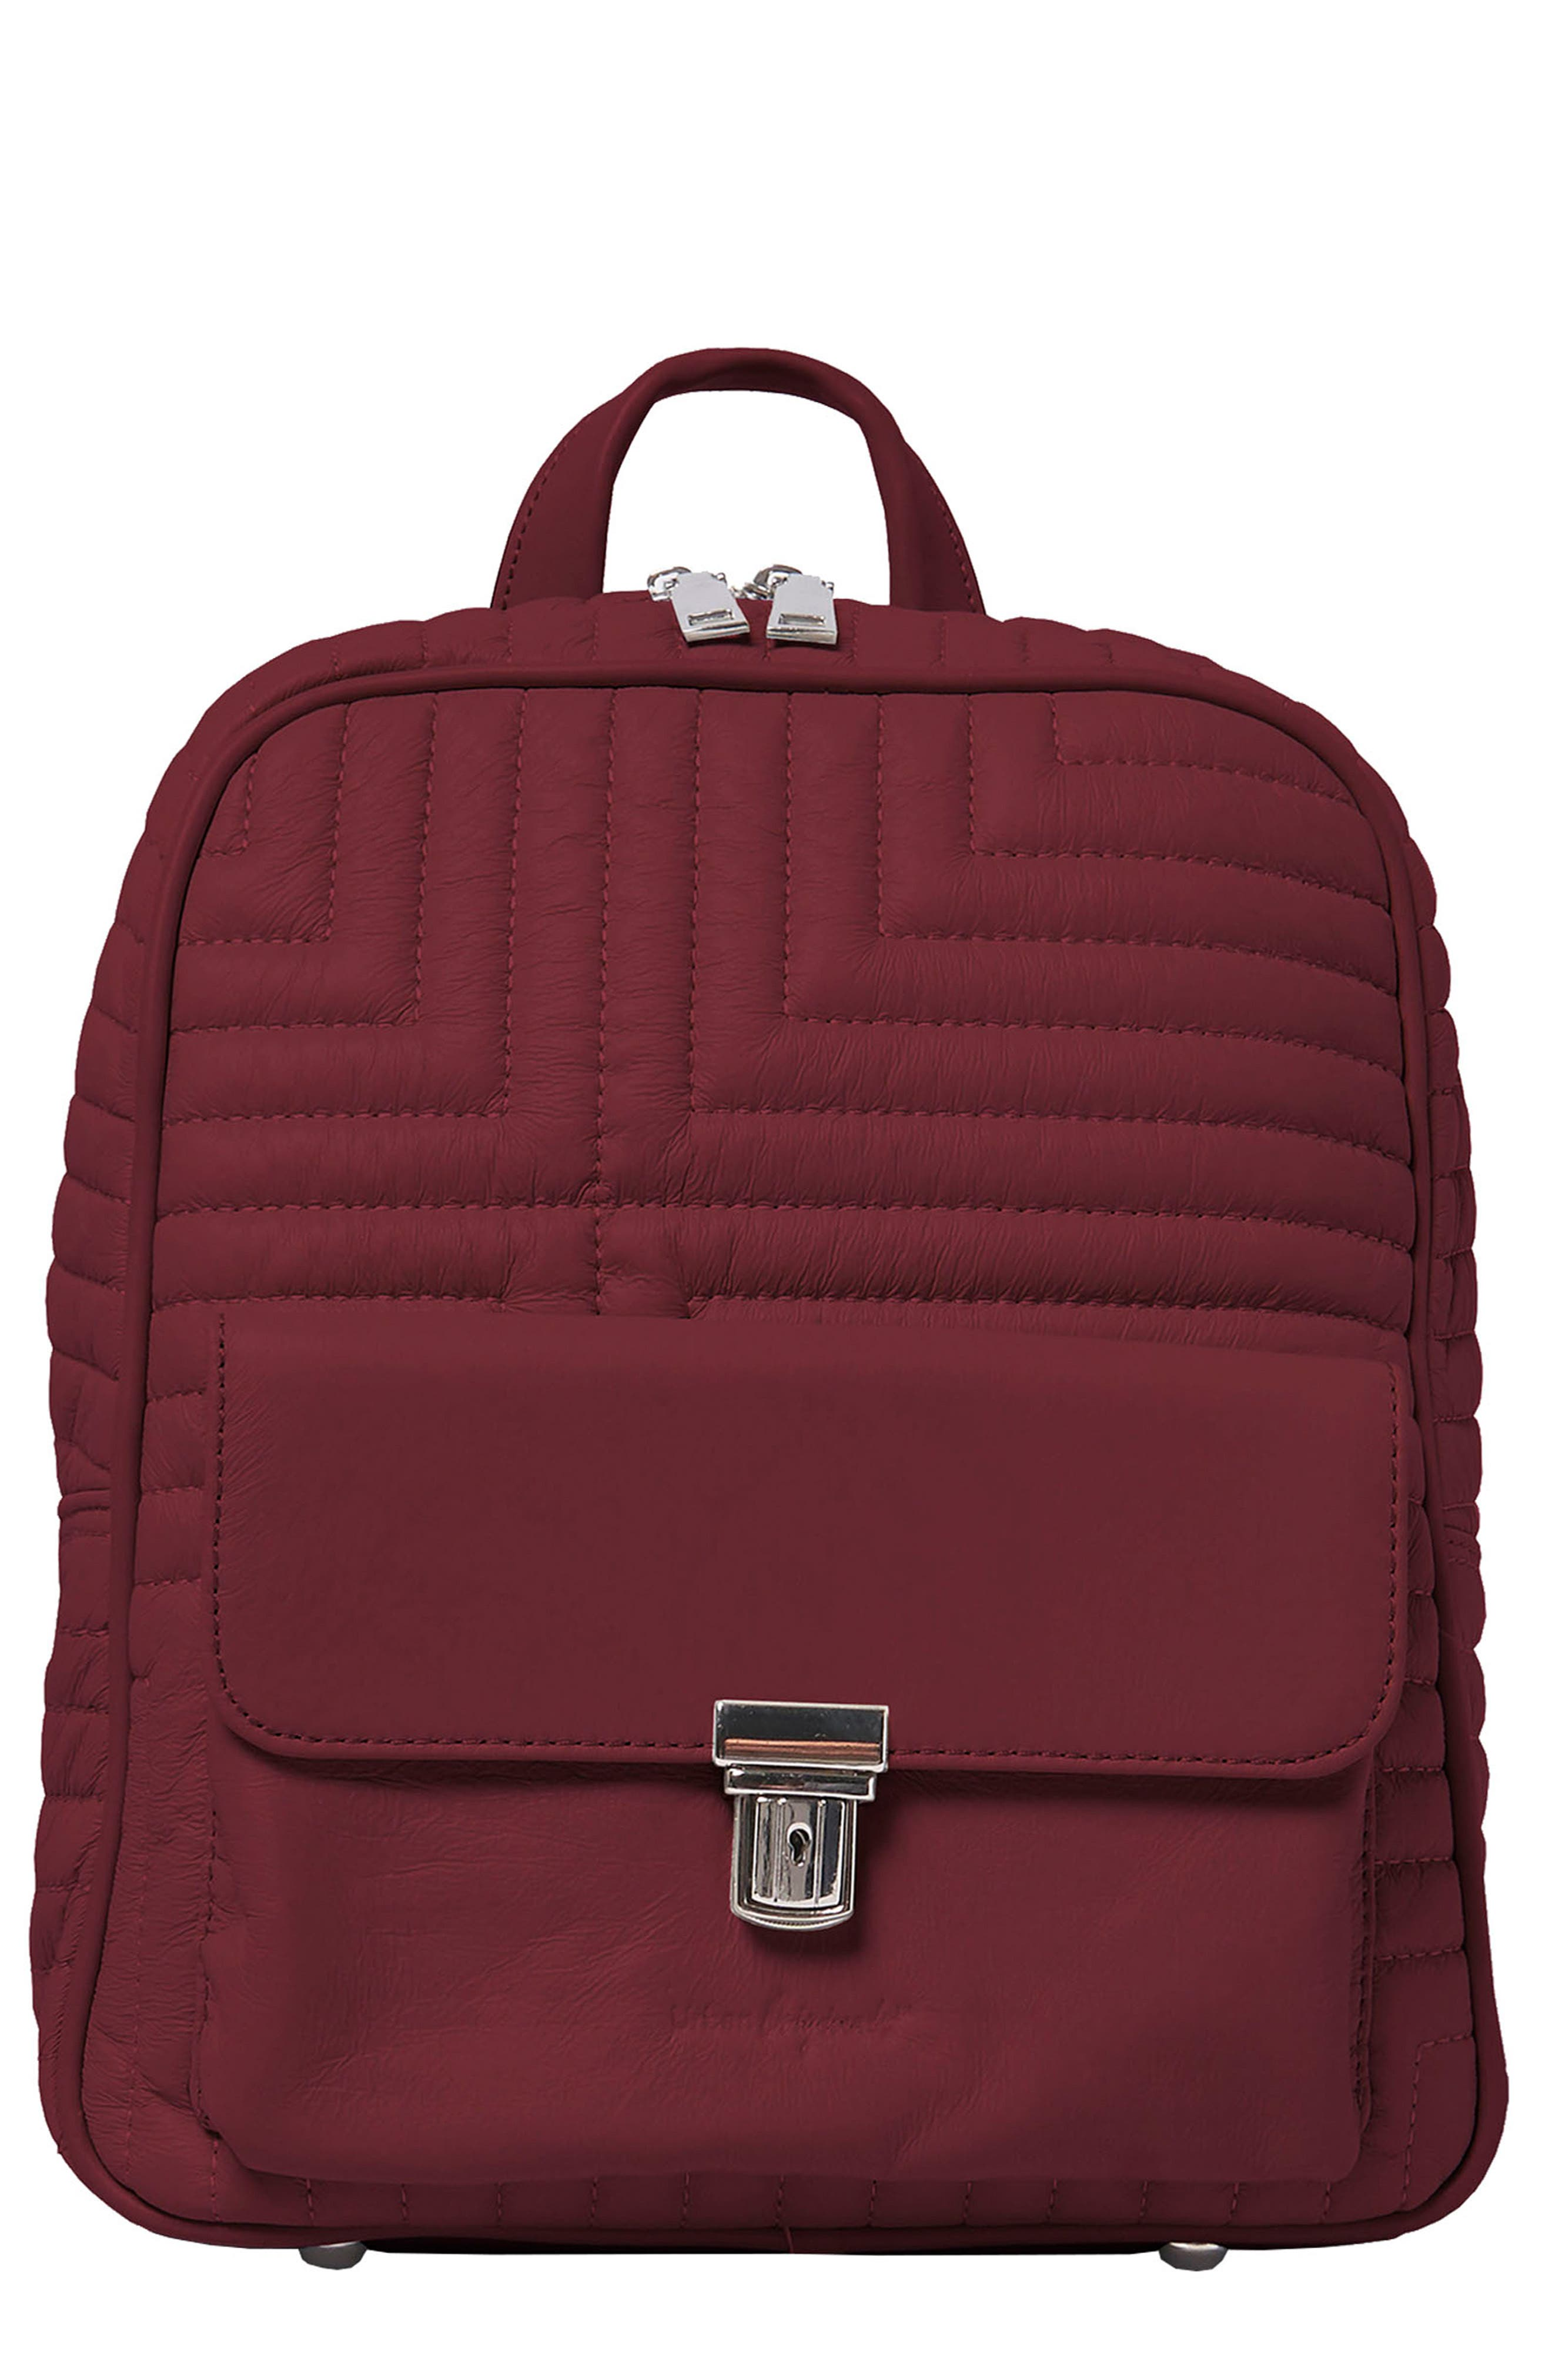 Essential Vegan Leather Backpack in Plum